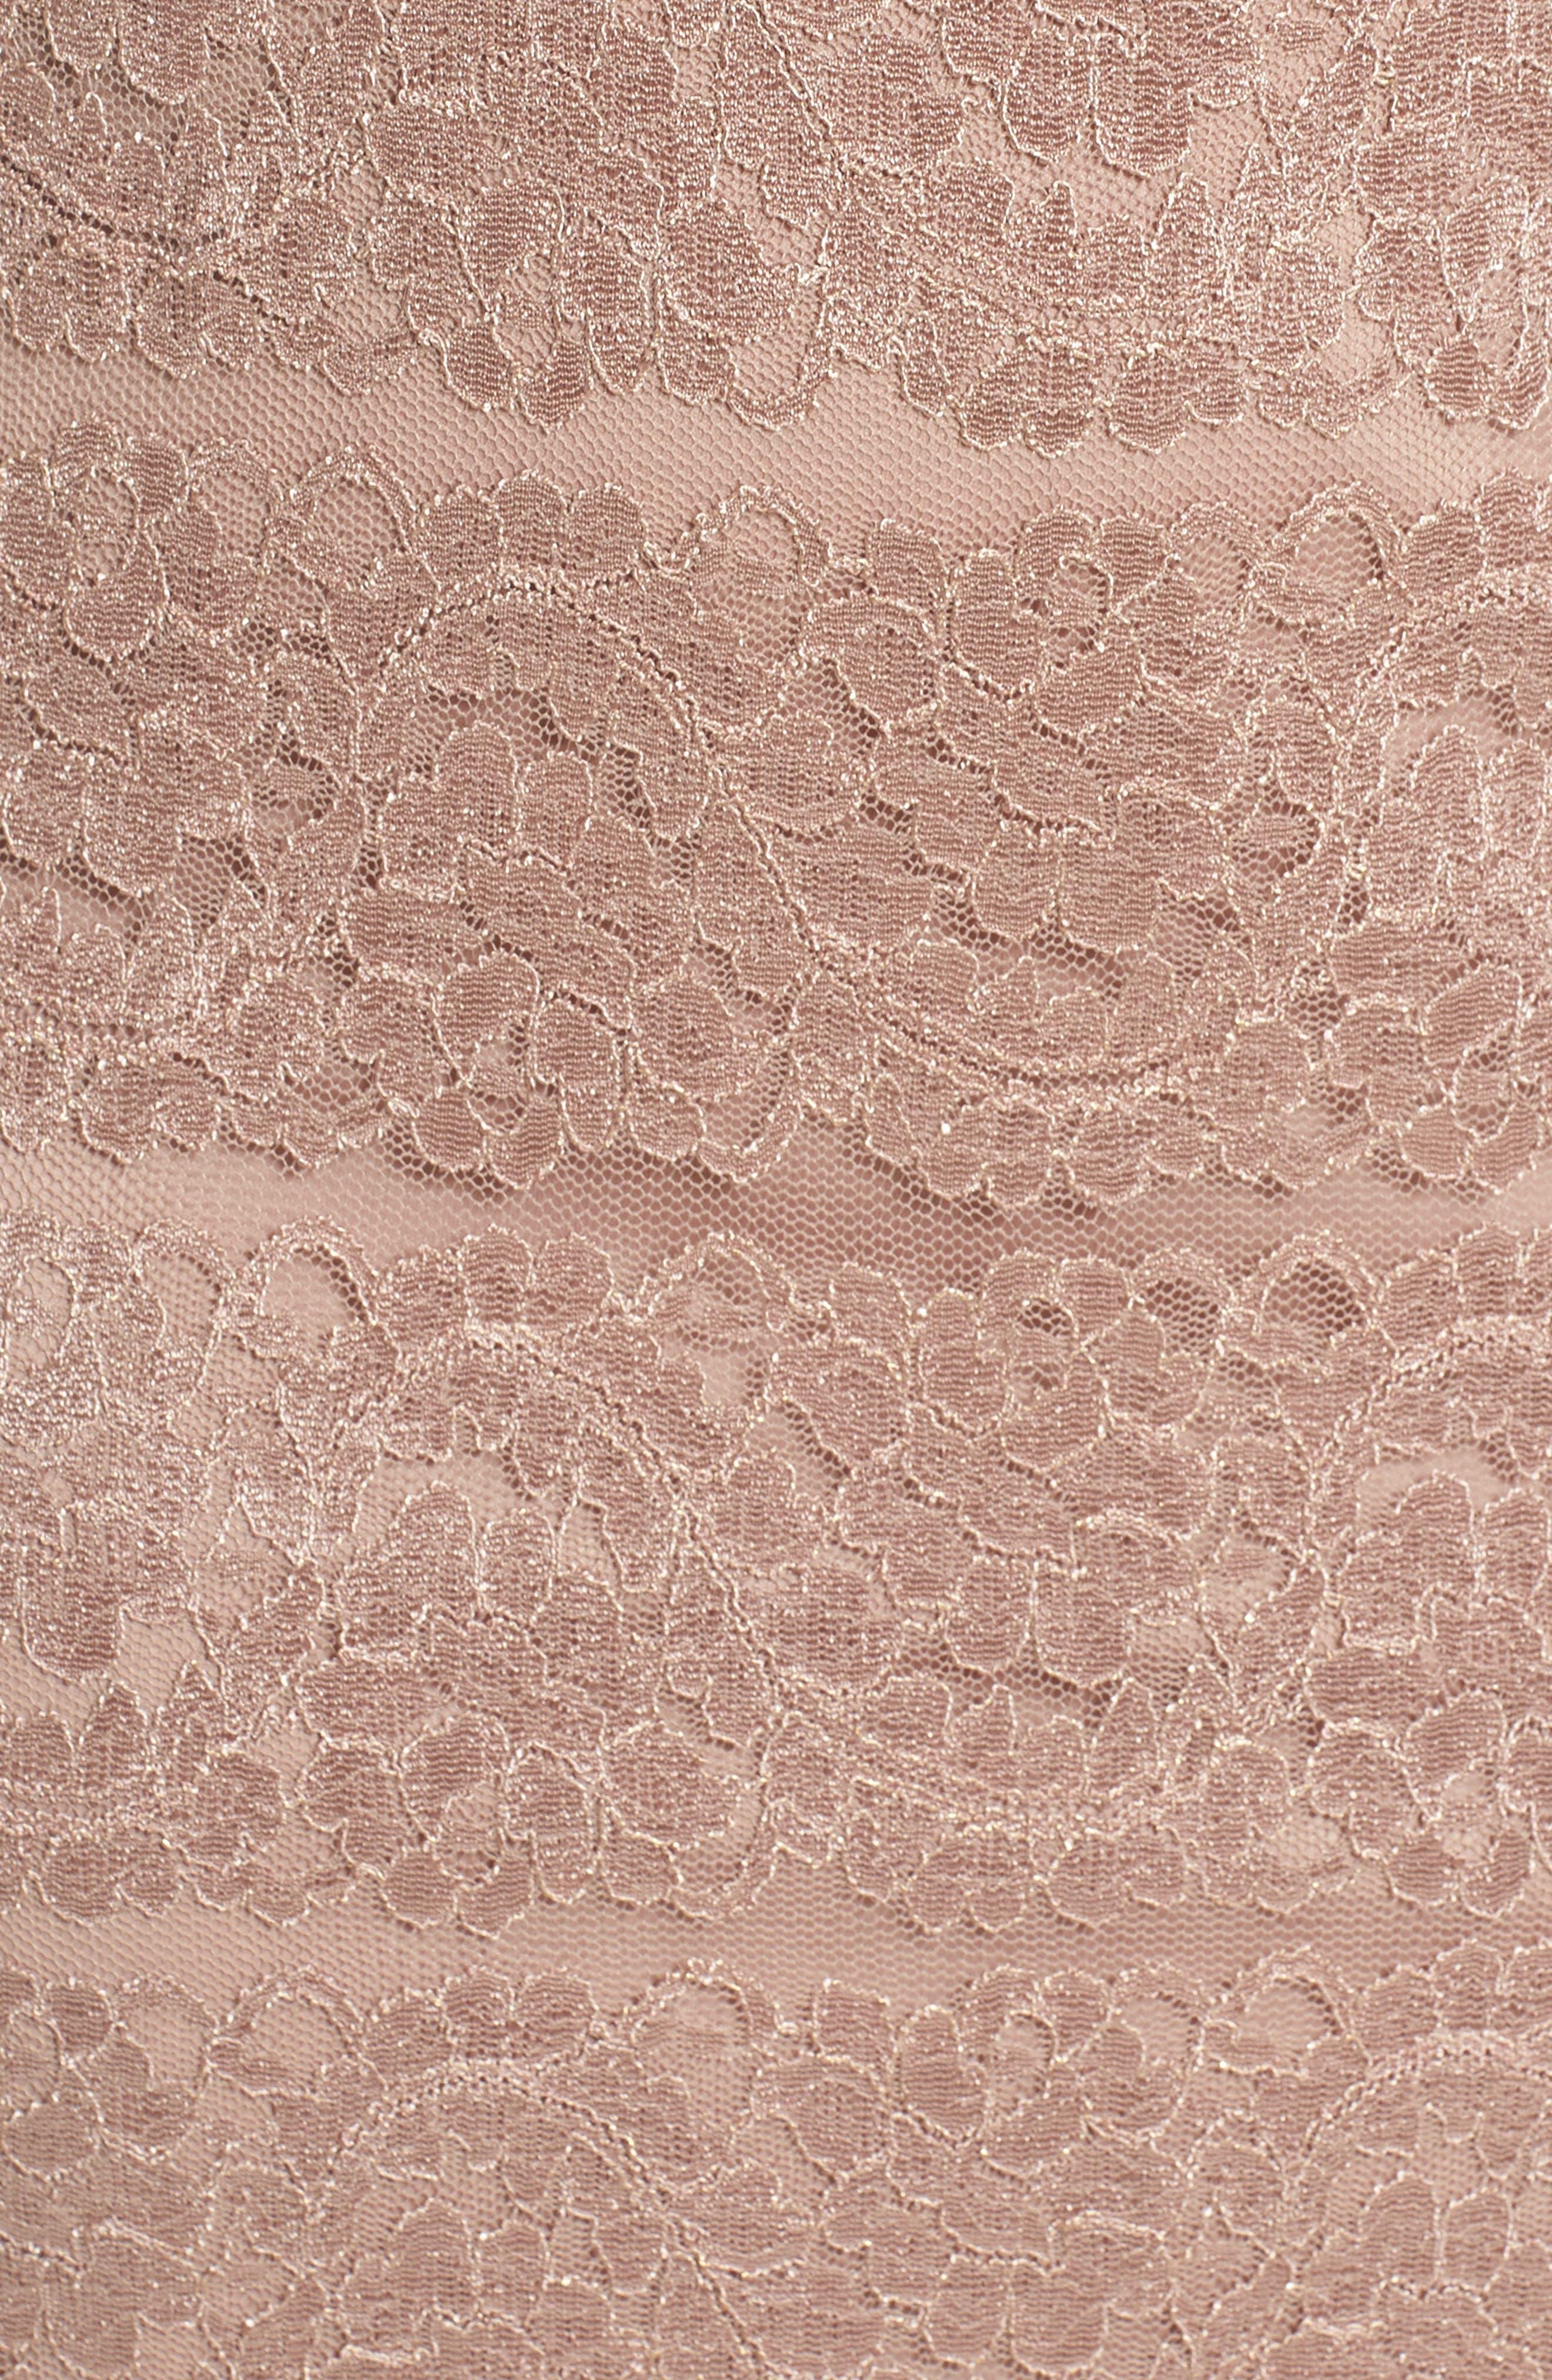 Lace Shift Dress,                             Alternate thumbnail 5, color,                             258